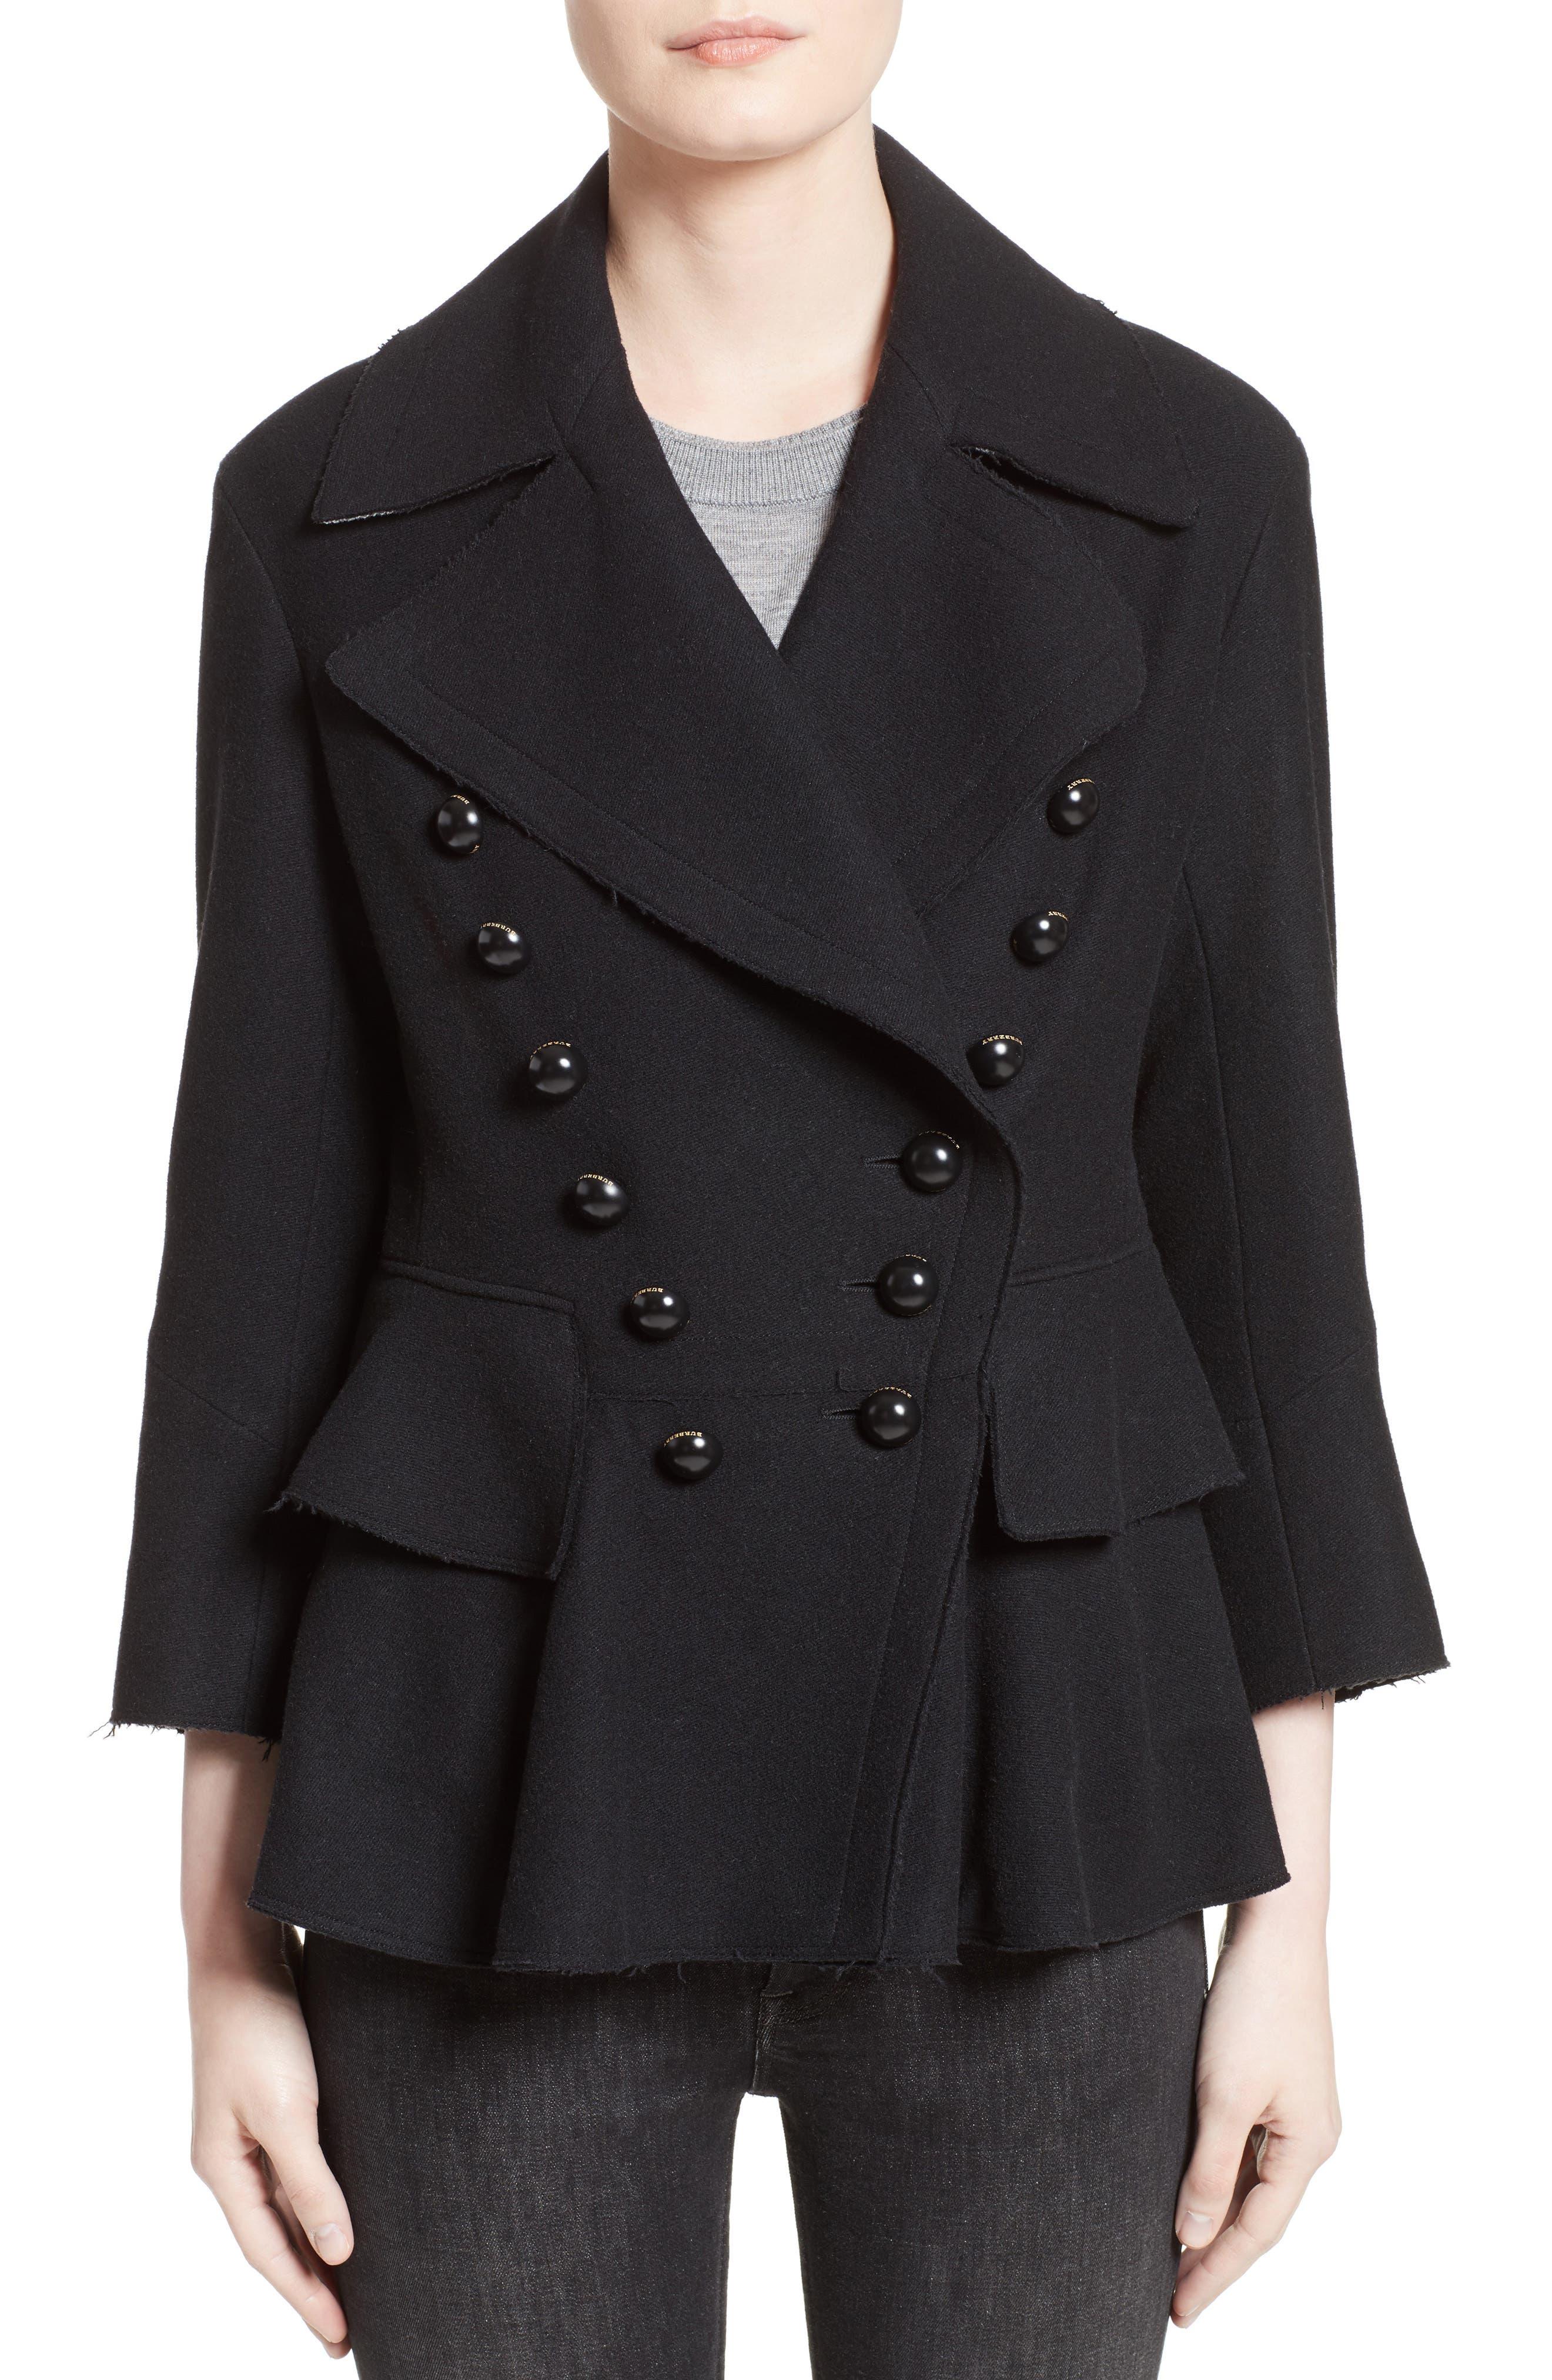 Alvingham Wool Blend Jacket,                         Main,                         color, 001